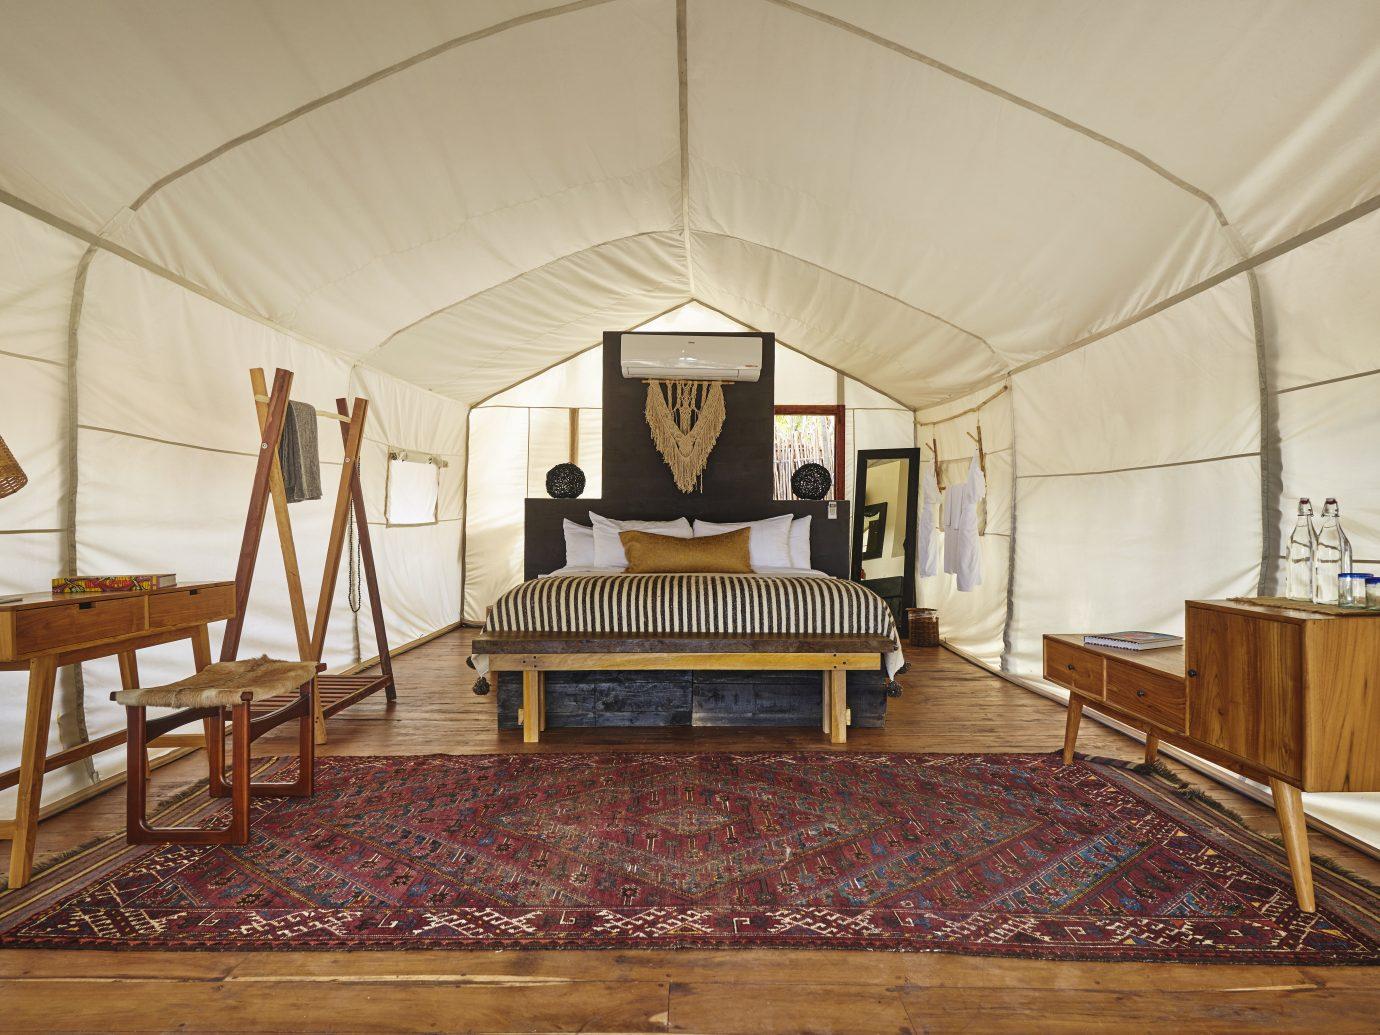 tent/bungalow room interior